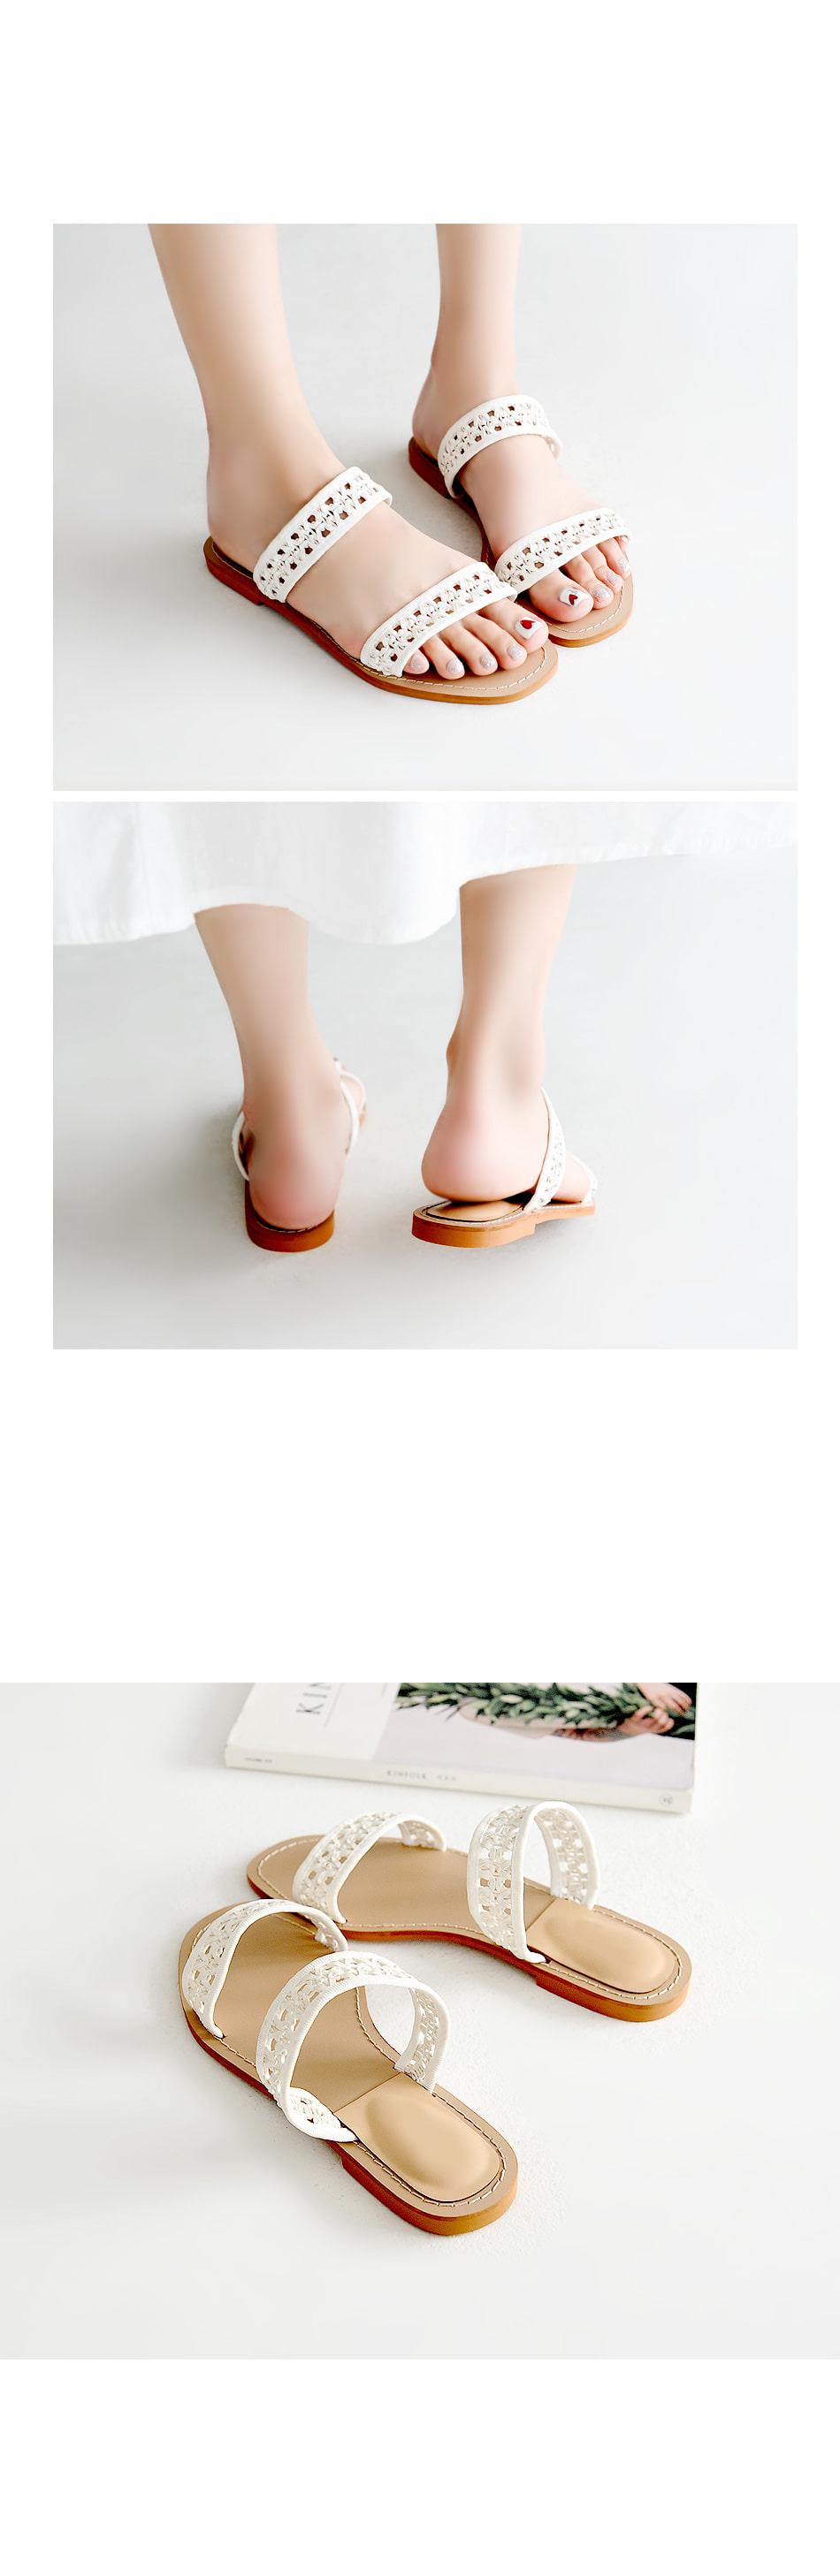 Jieck Slippers 1cm